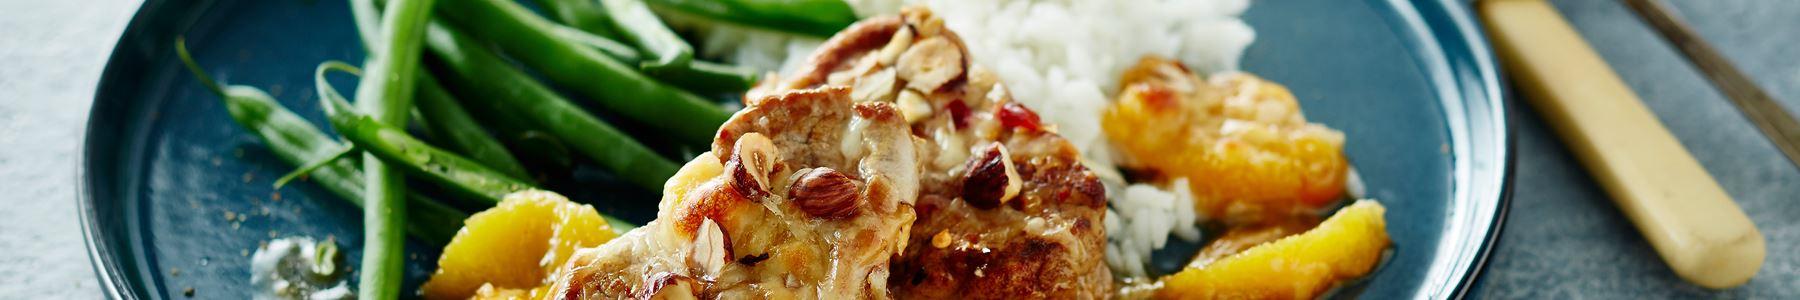 Svinemørbrad + Mozzarella